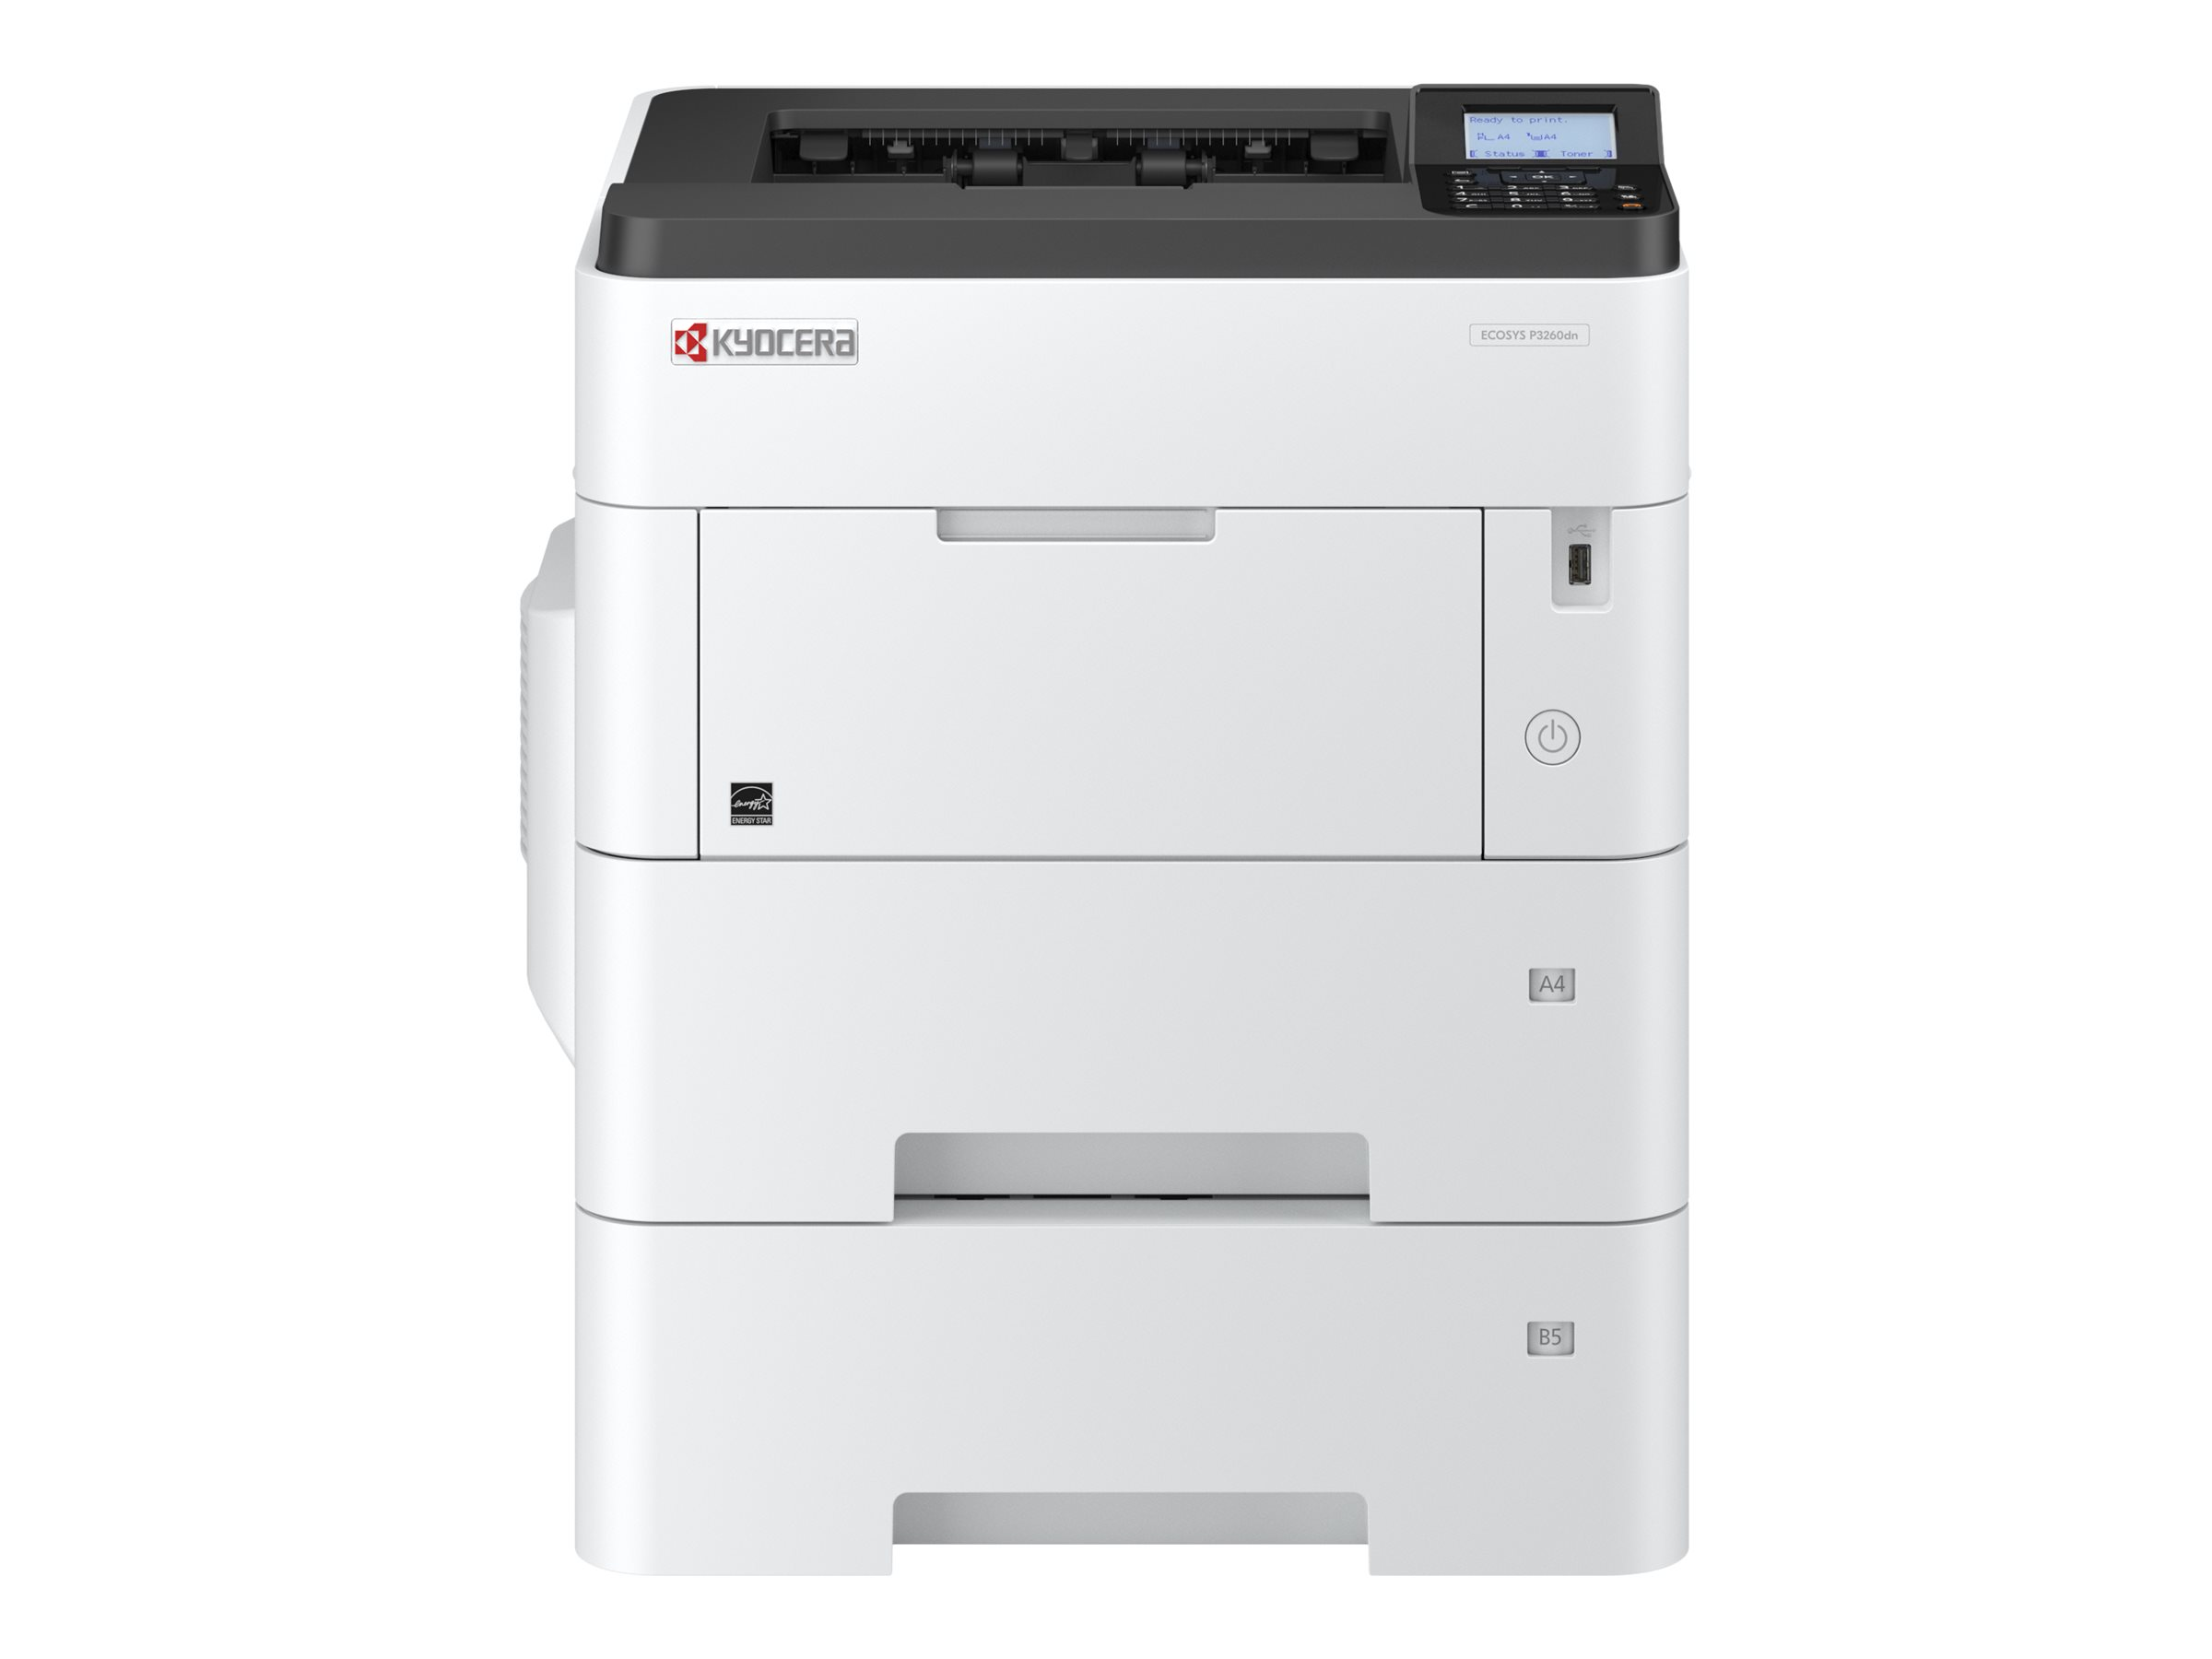 Kyocera ECOSYS P3260dn - Drucker - s/w - Duplex - Laser - A4/Legal